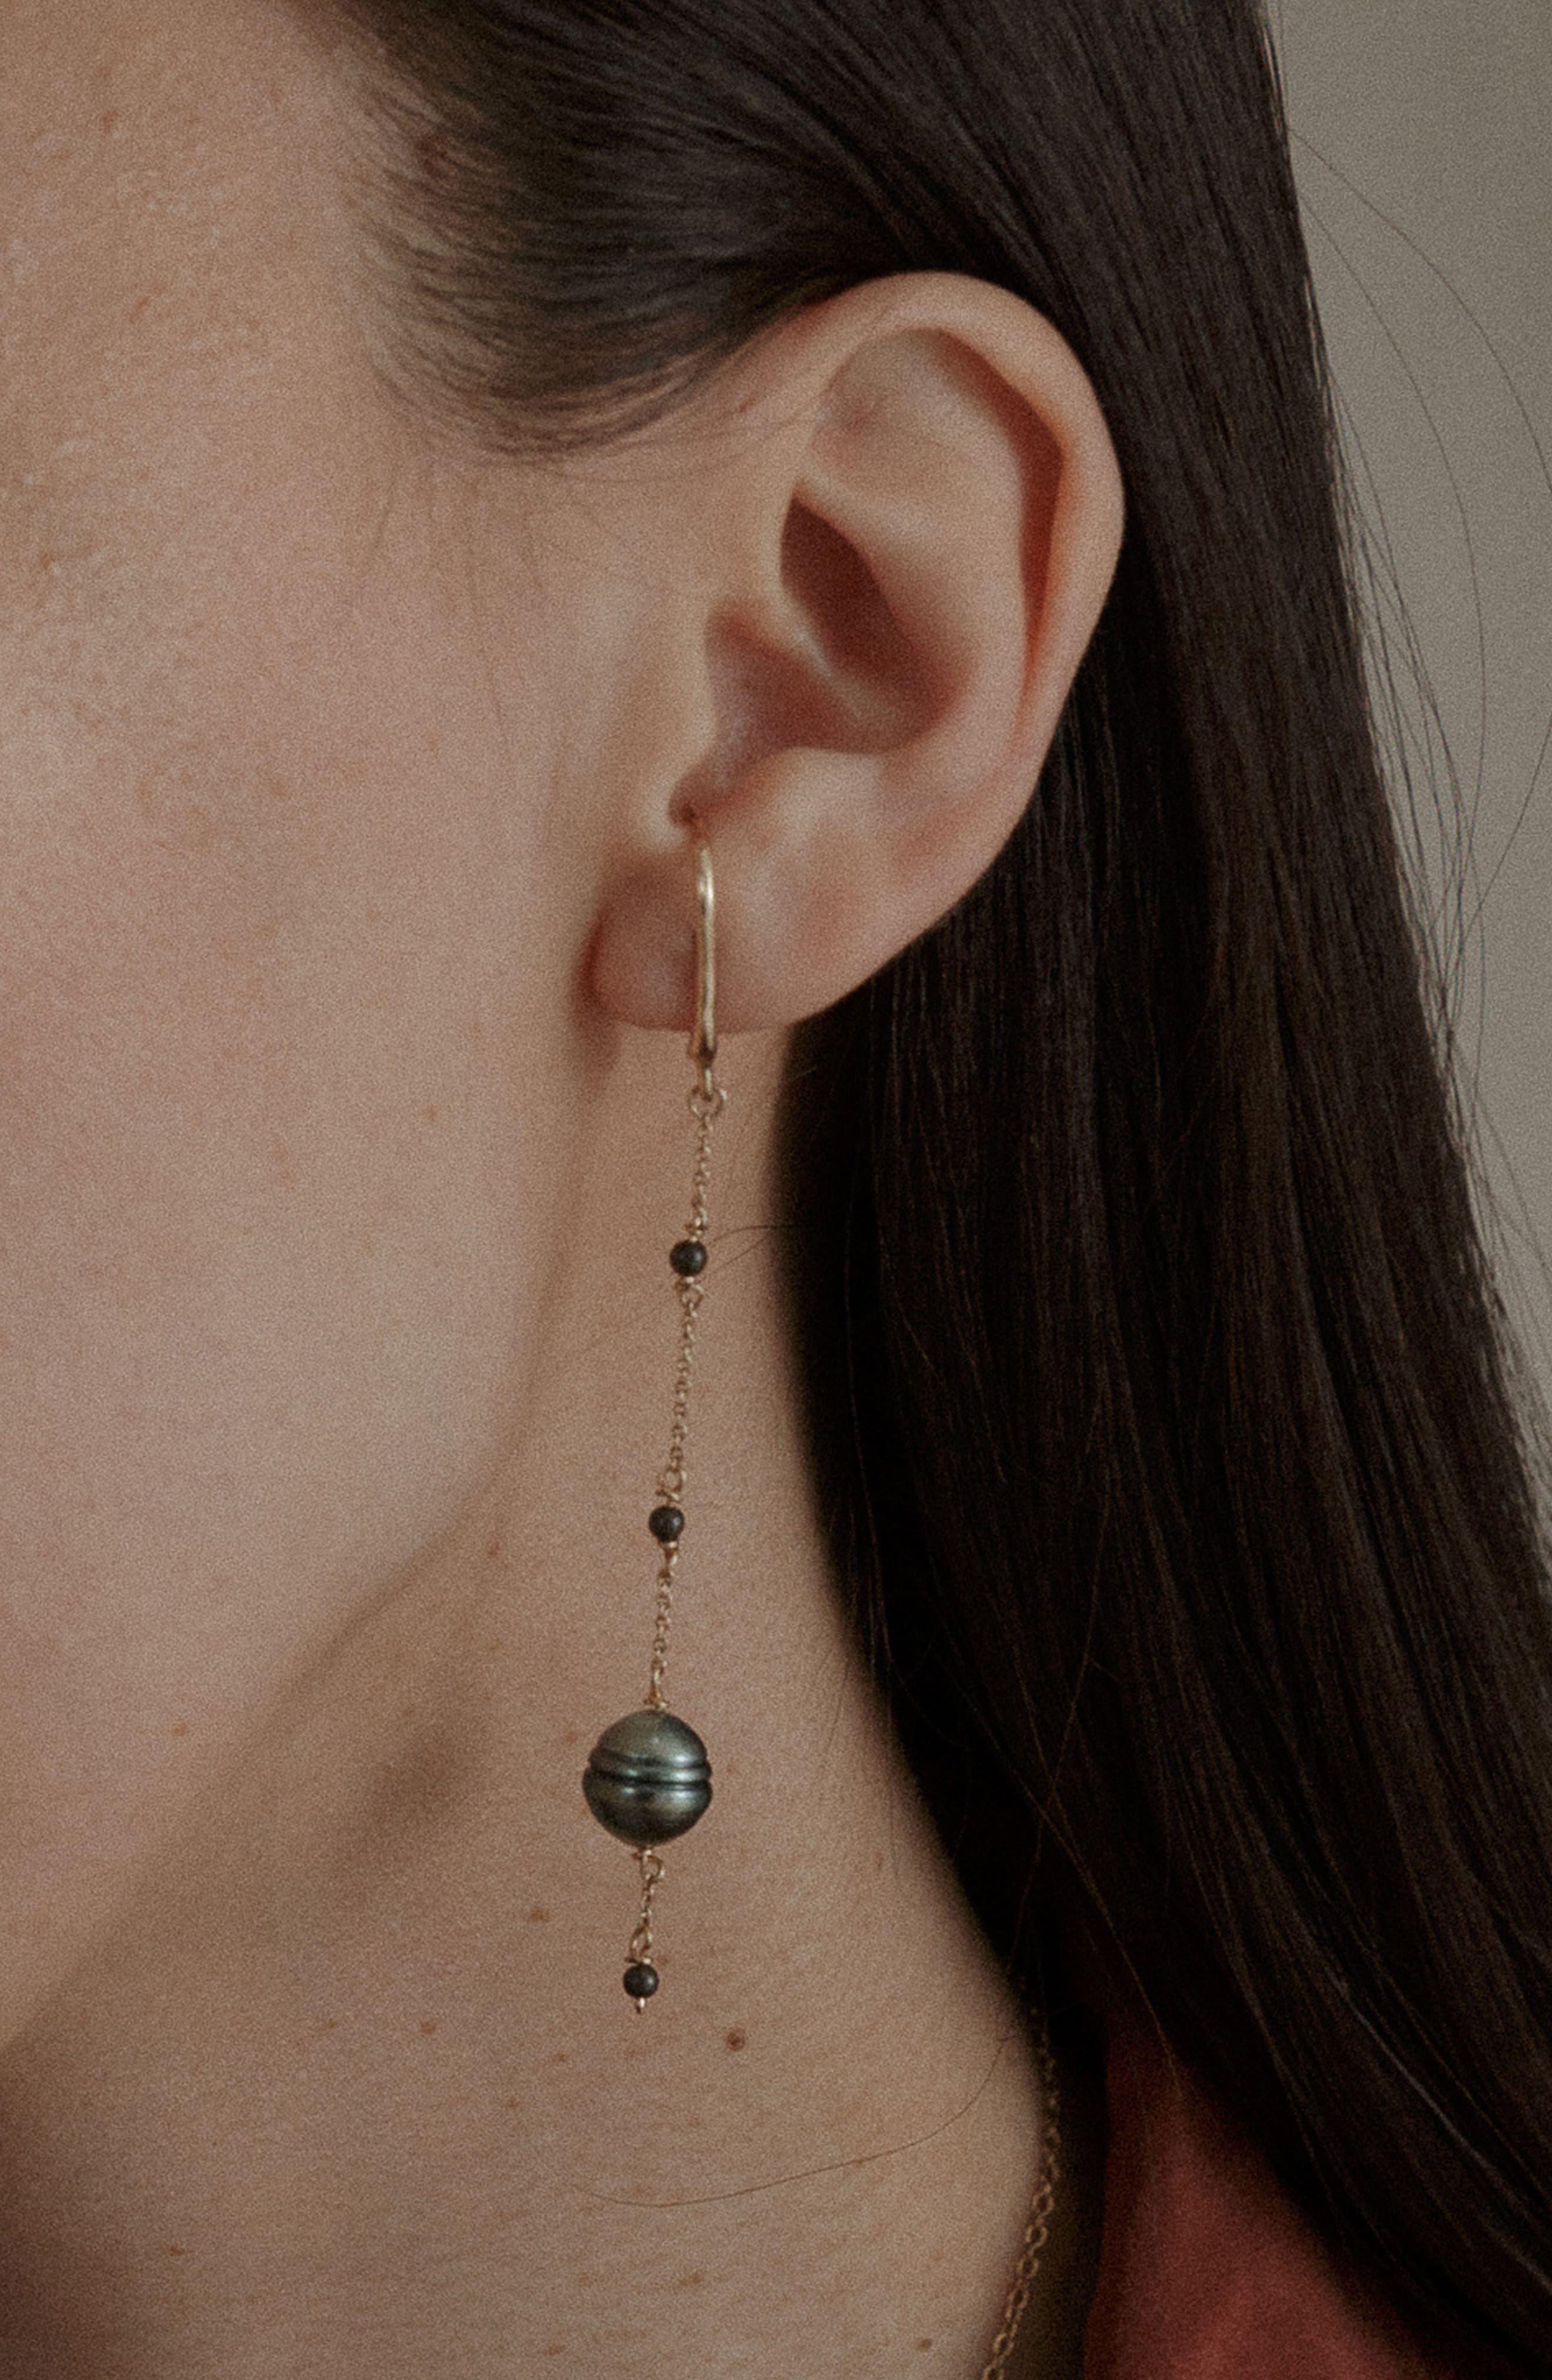 Aura Cultured Pearl Drop Earrings,                             Alternate thumbnail 6, color,                             Gold/ Black Pearl